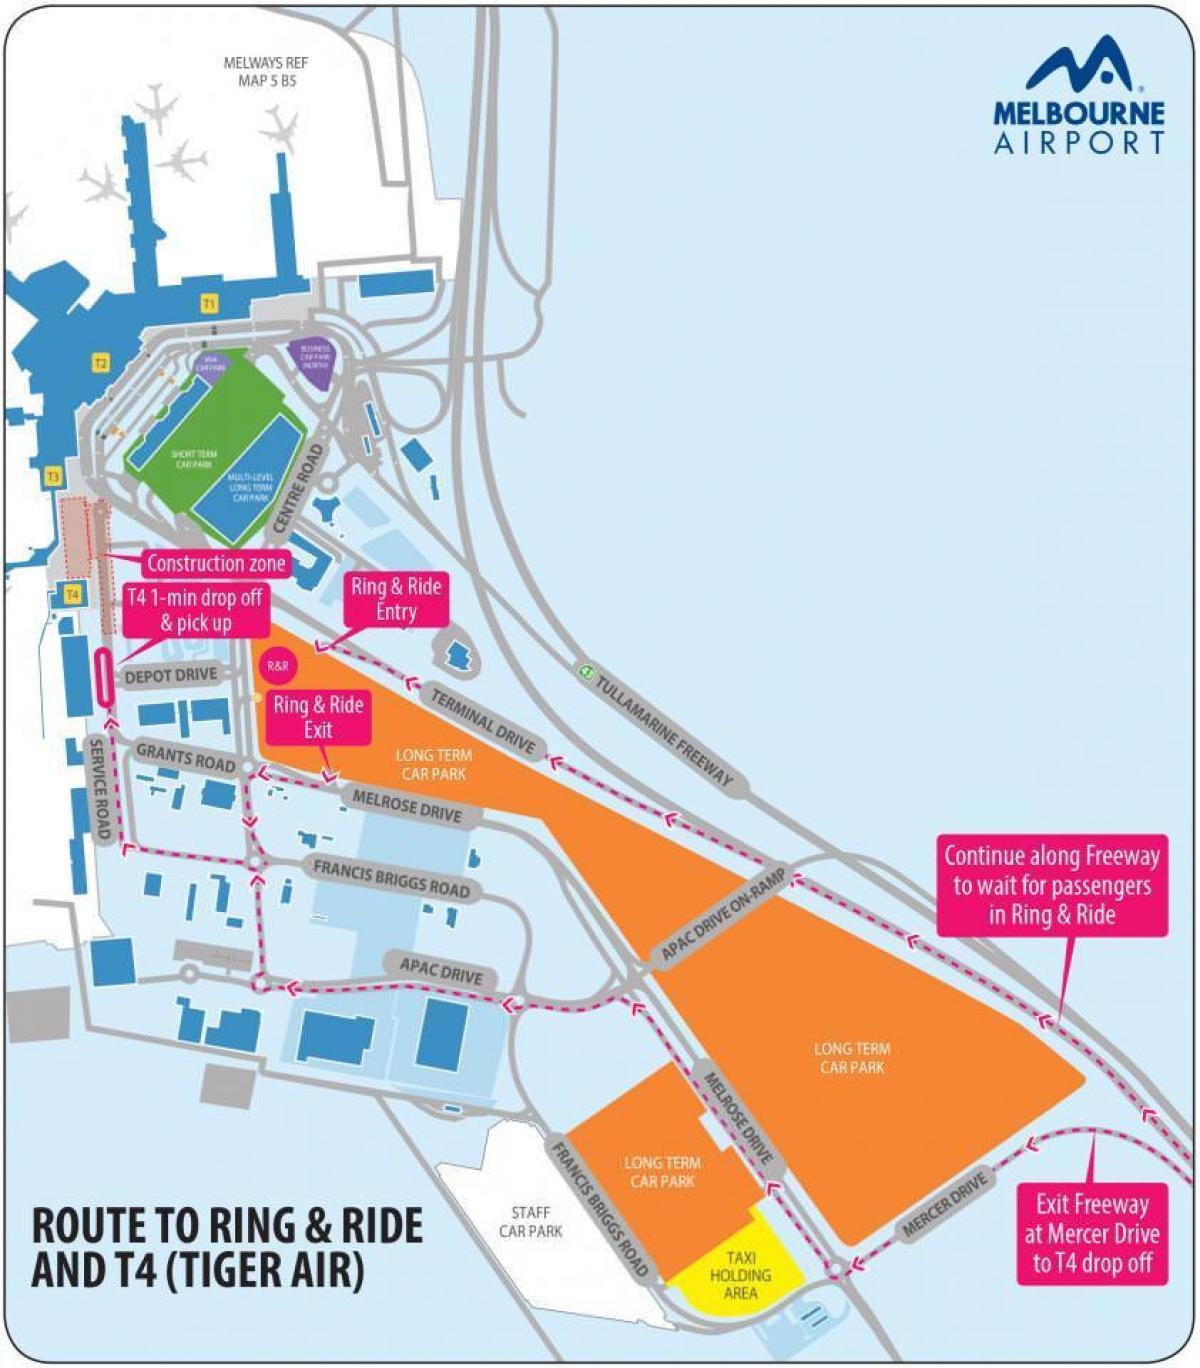 Melbourne airport terminal 4 ramani Melbourne airport t4 ramani